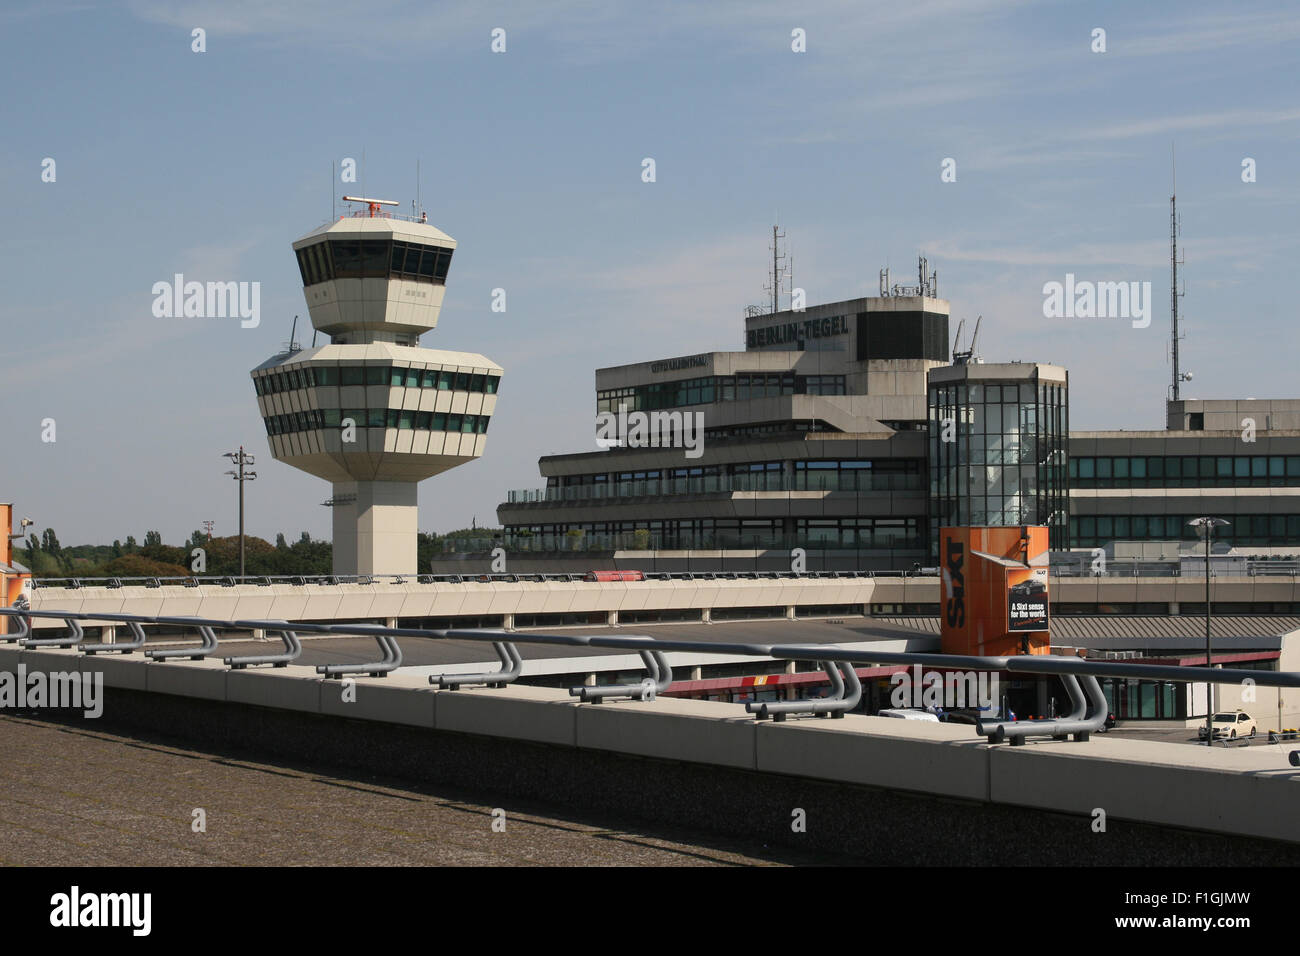 BERLIN TEGEL AIRPORT ATC TOWER CONTROL - Stock Image